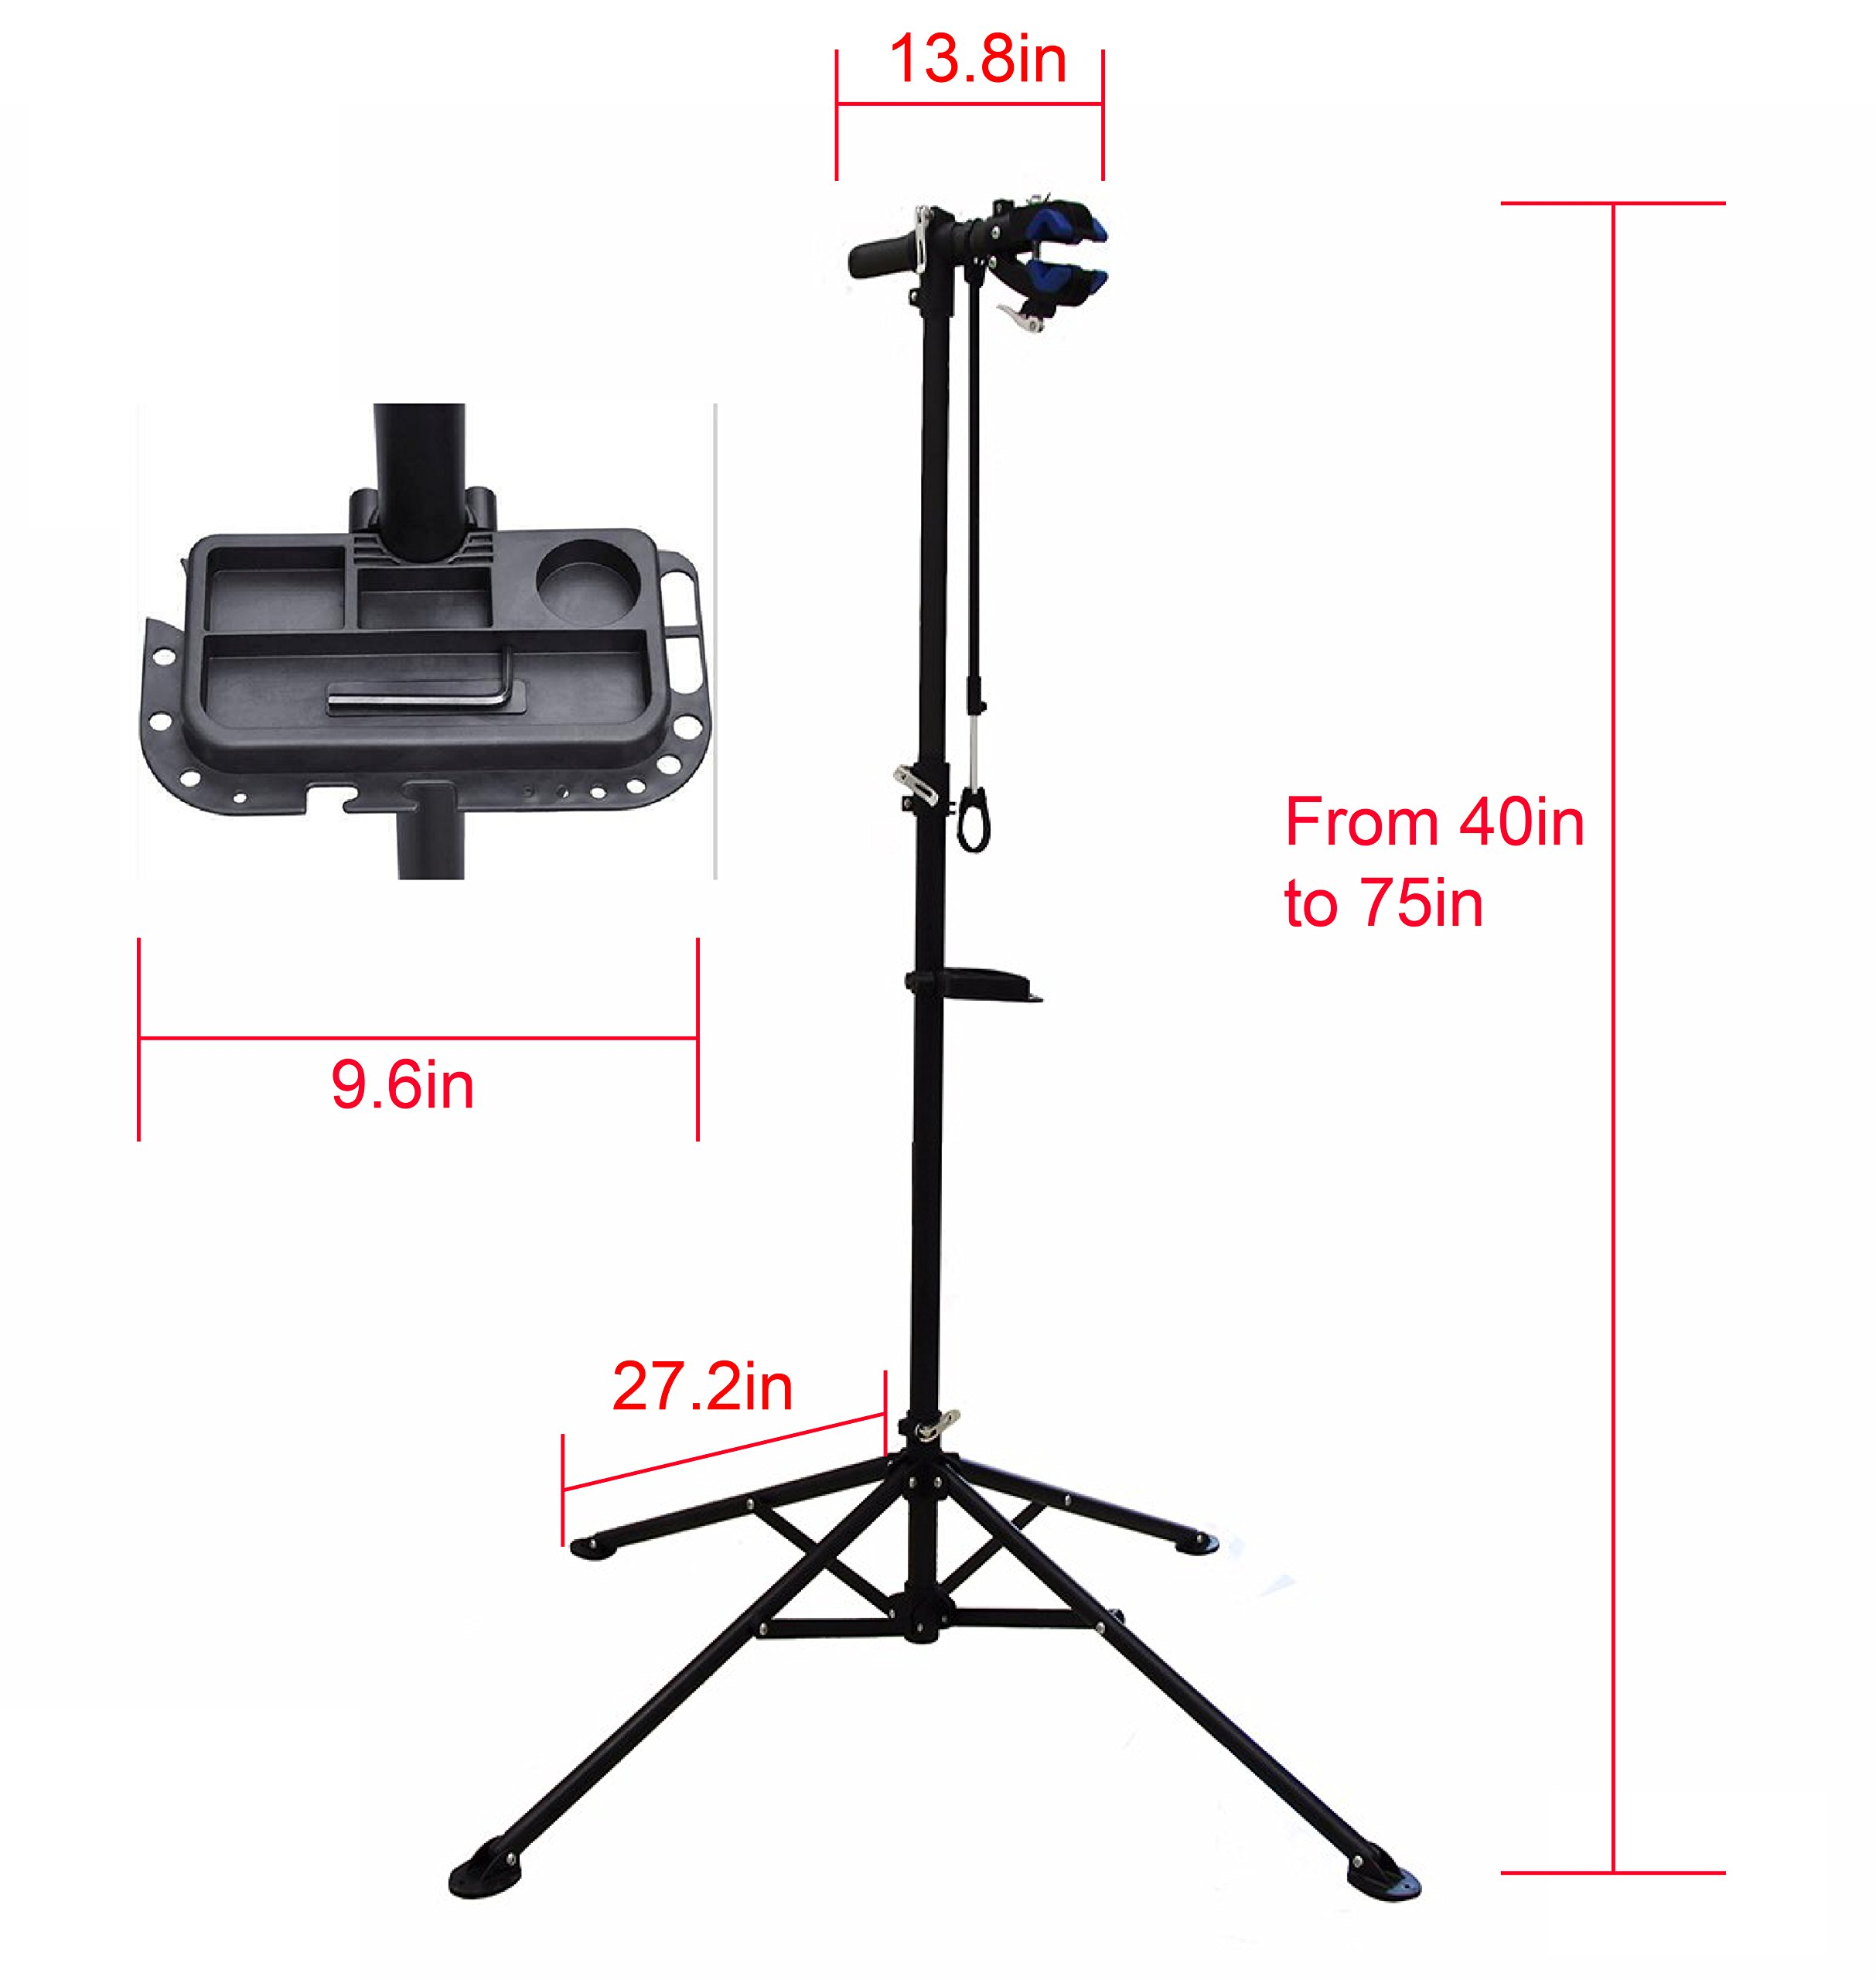 MaxxHaul 80725 Bike Repair Stand/Display with Adjustable Height & 360 Deg. Rotating Head Clamp by MaxxHaul (Image #9)